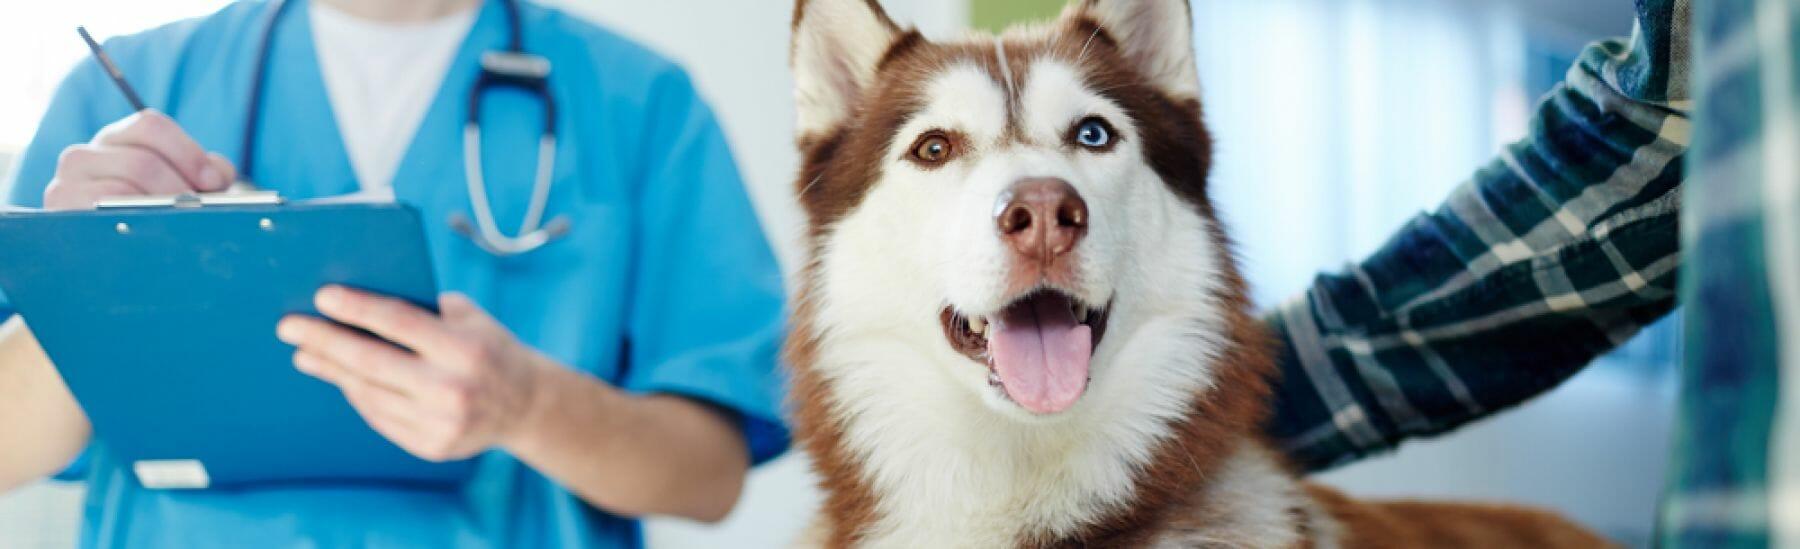 Referral Forms | McKnight 24 Hour Veterinary Hospital